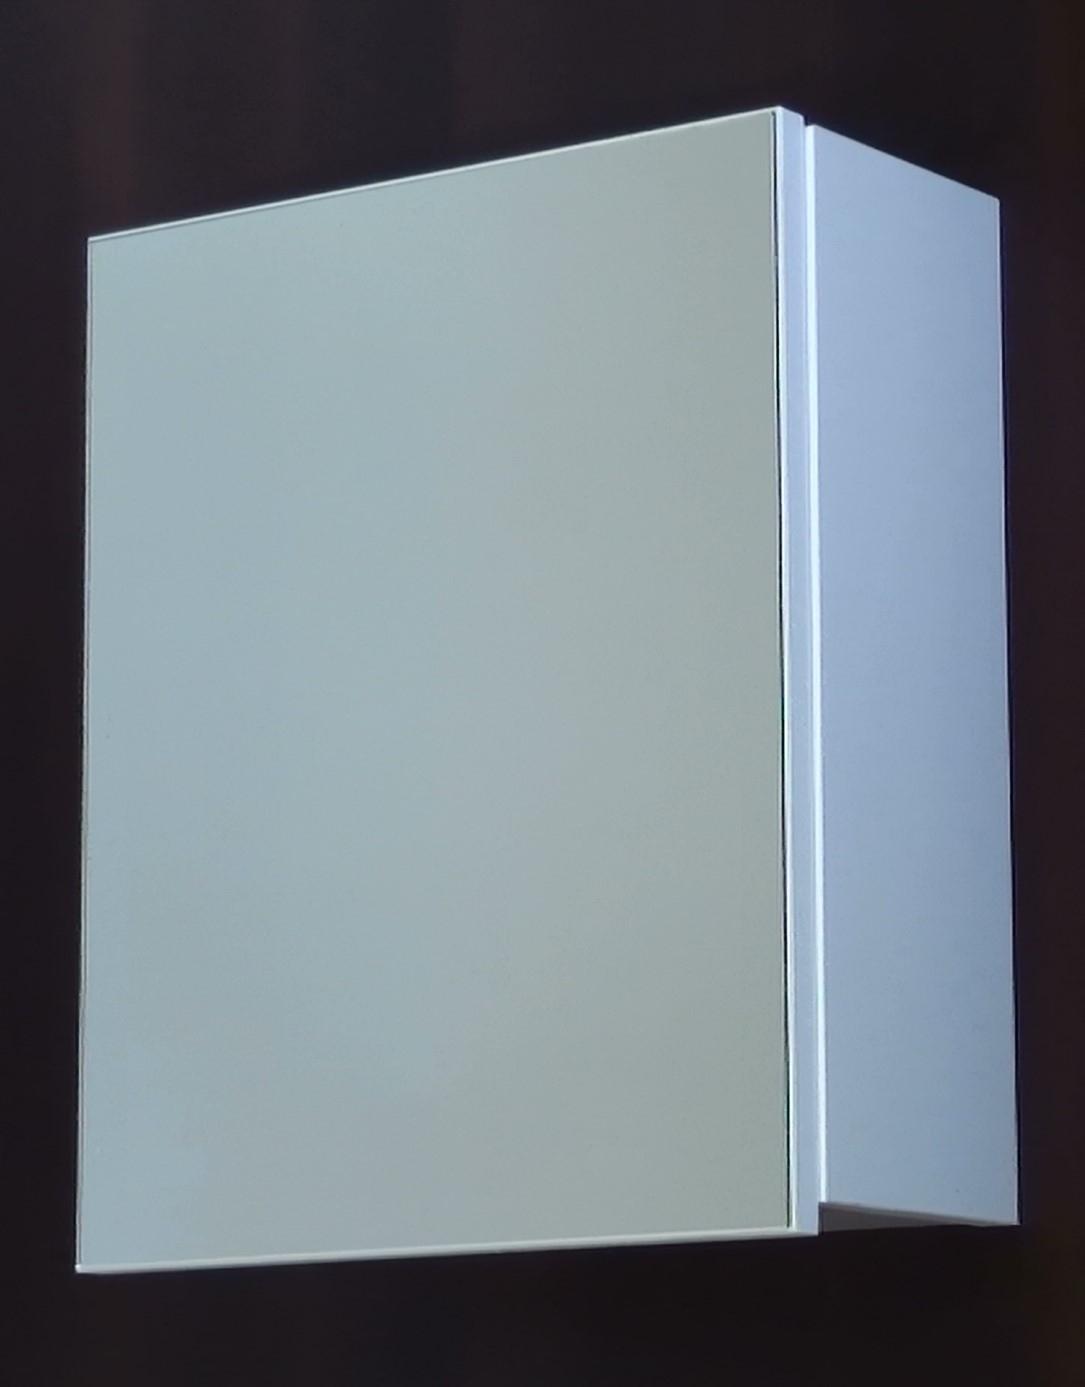 Kabinet vaňa zrkadlo 40 cm biele